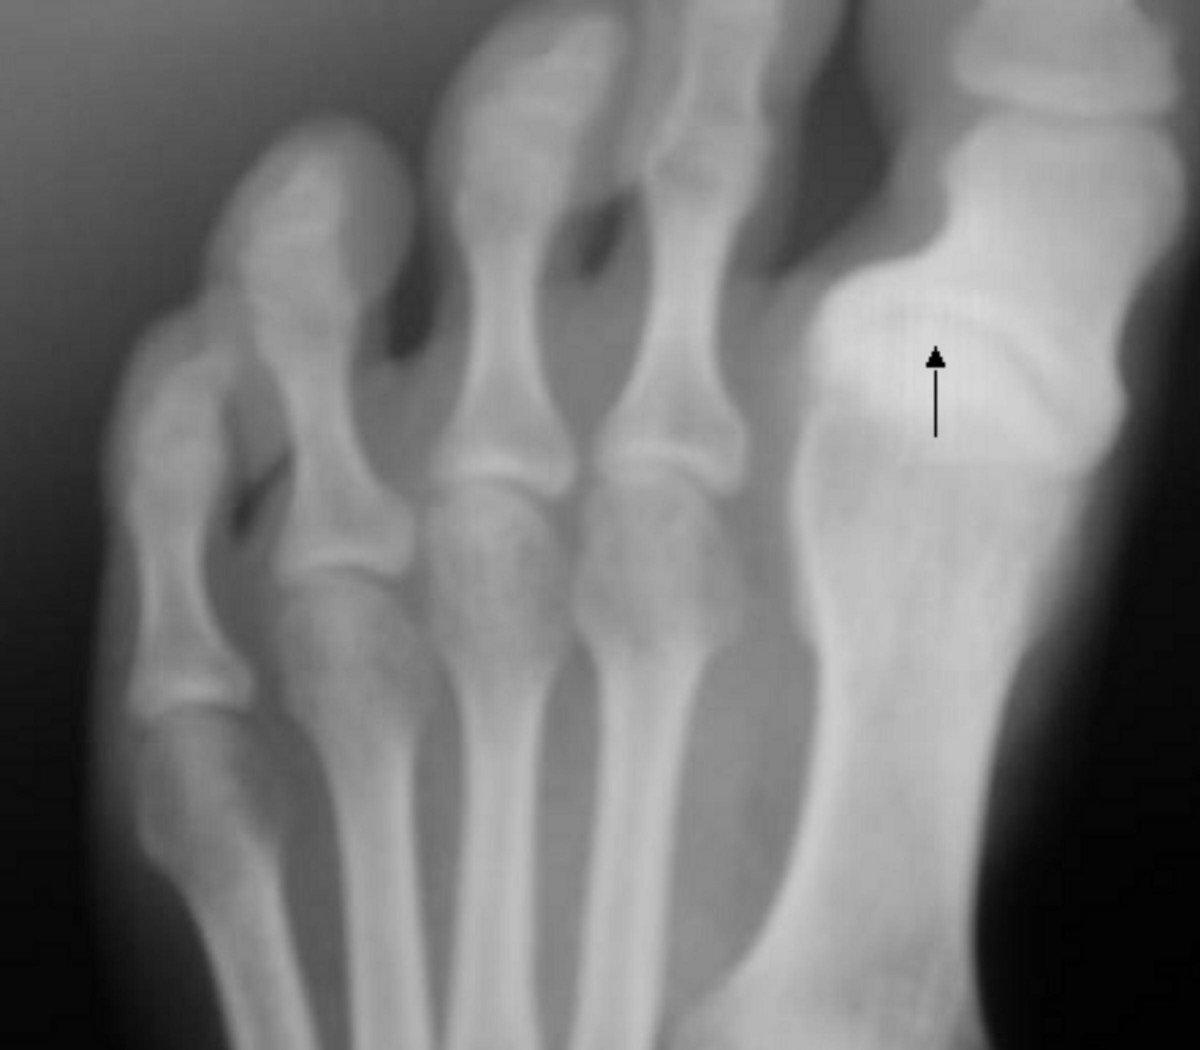 Un pied atteint de l'arthrose. | Wikimedia Commons